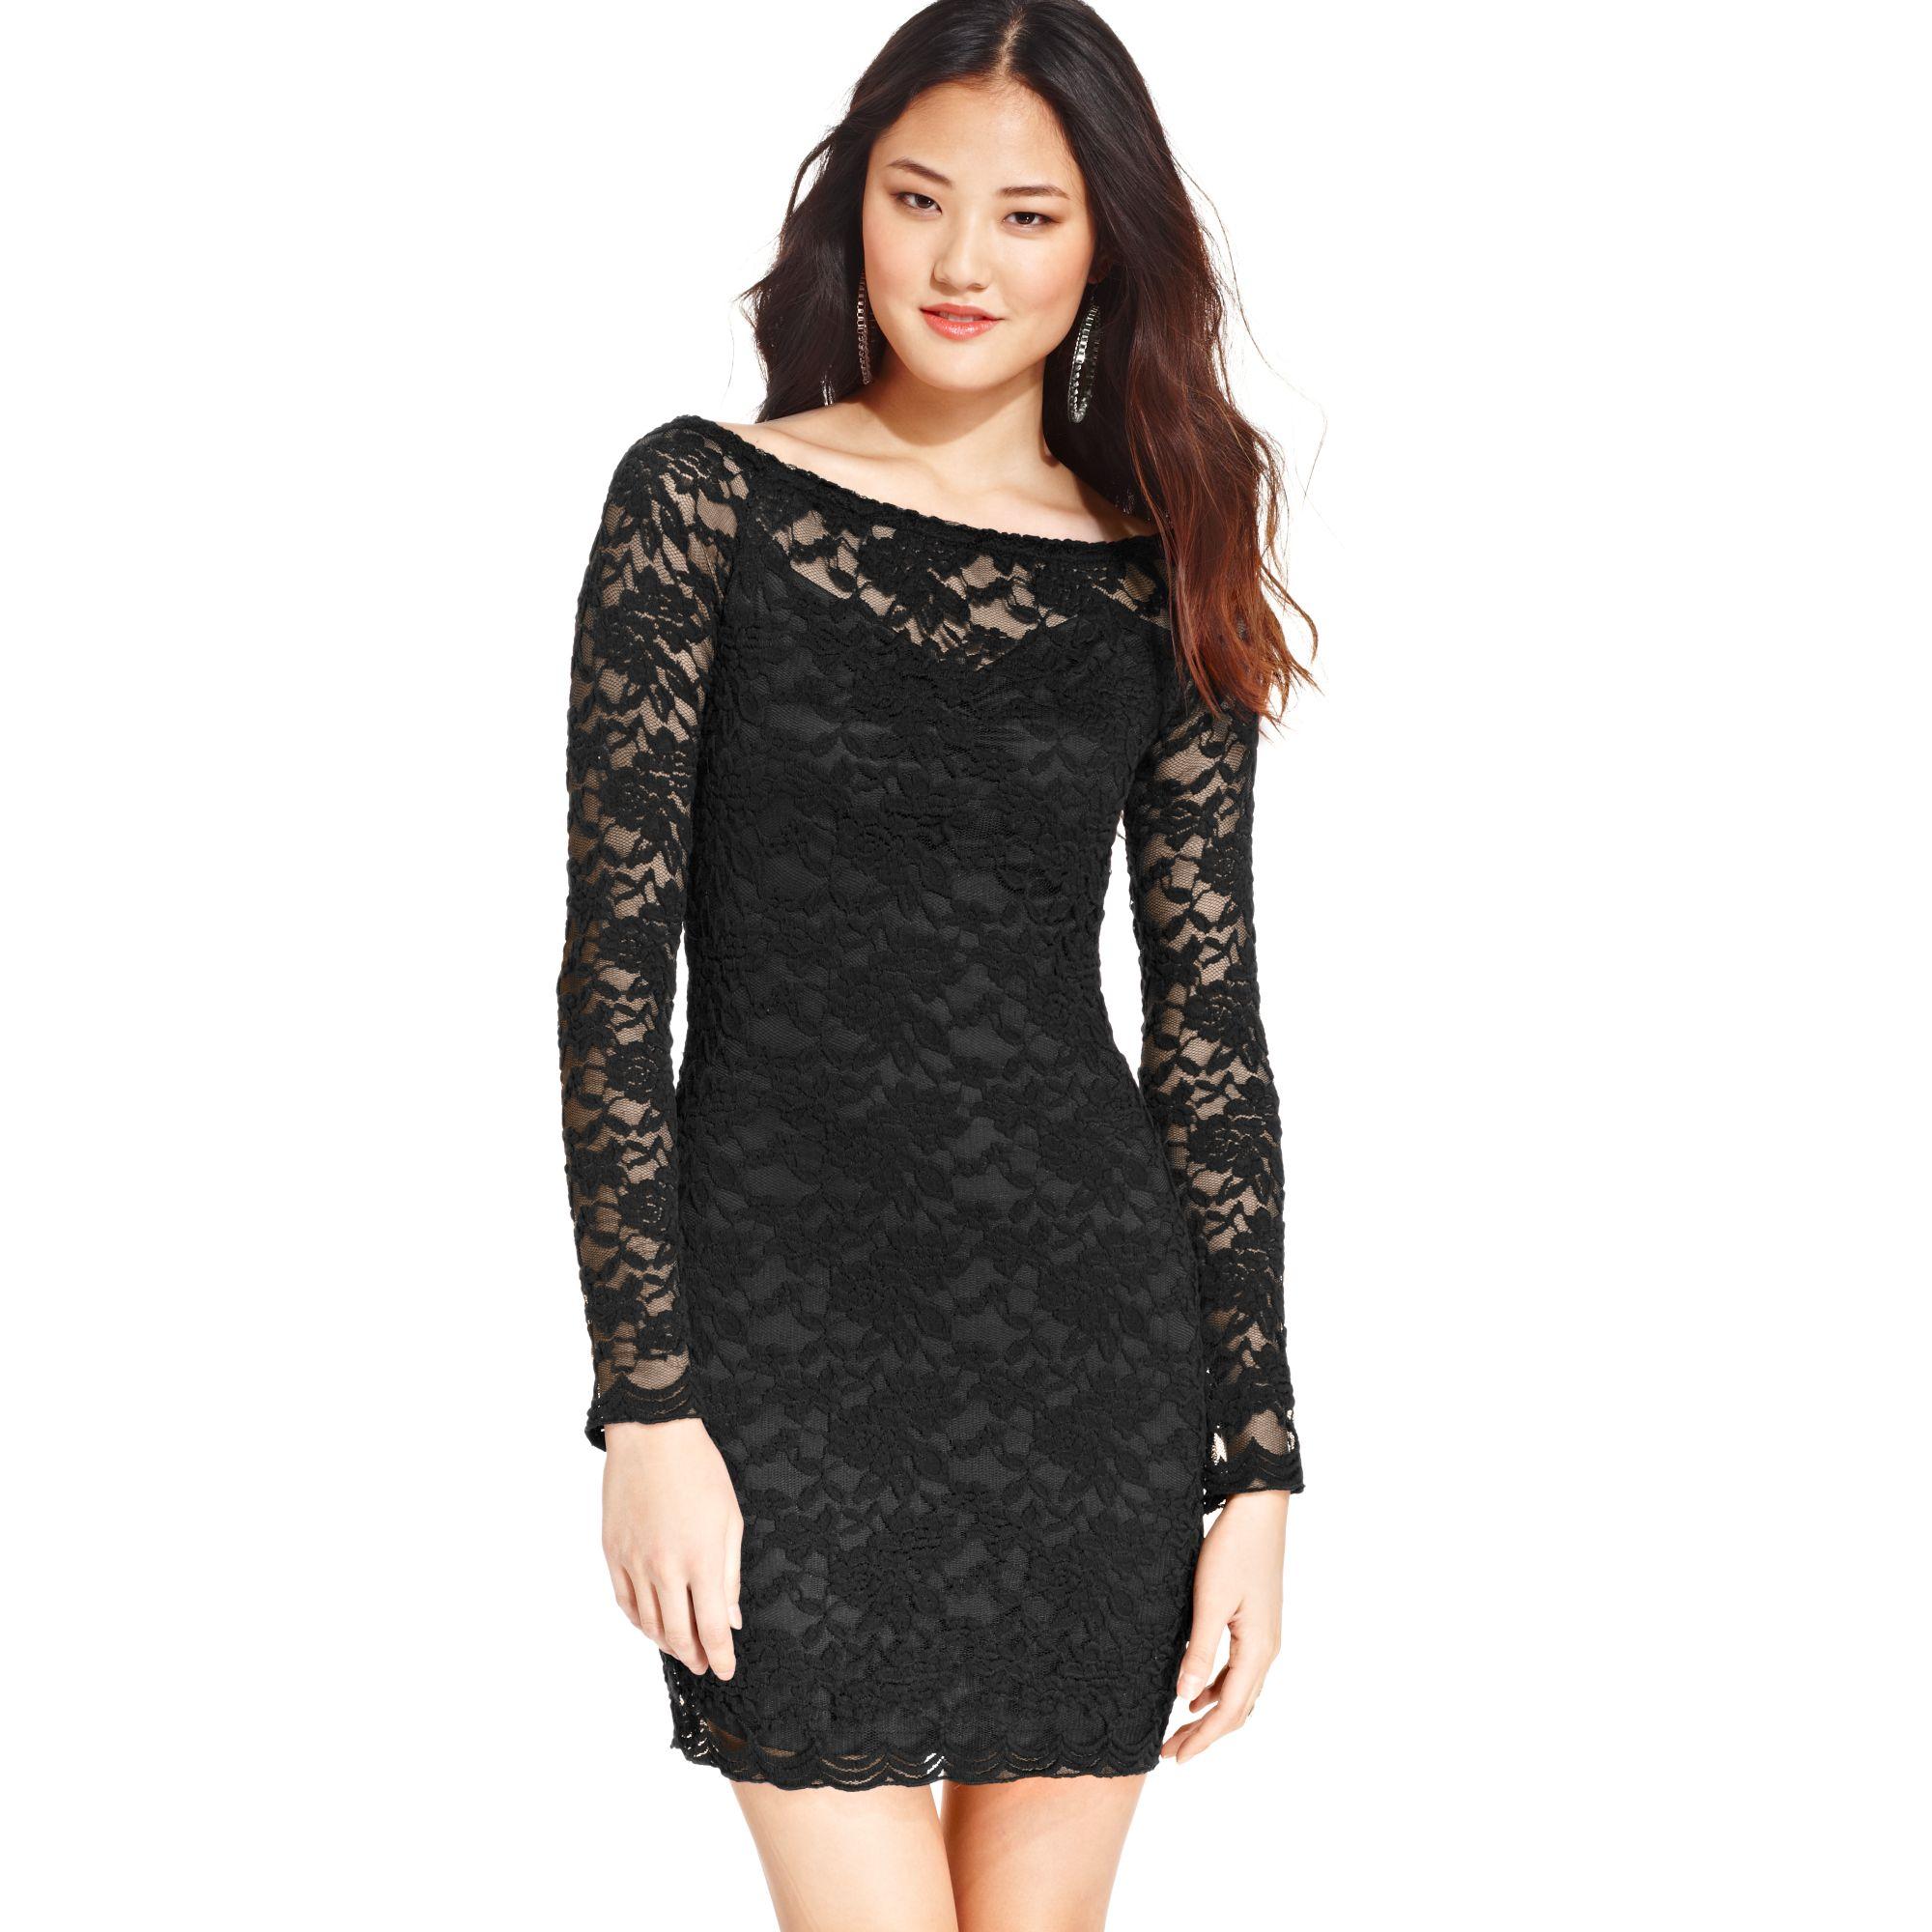 0377d3c602c77 Lyst - Material Girl Juniors Boat Neck Lace Dress in Black